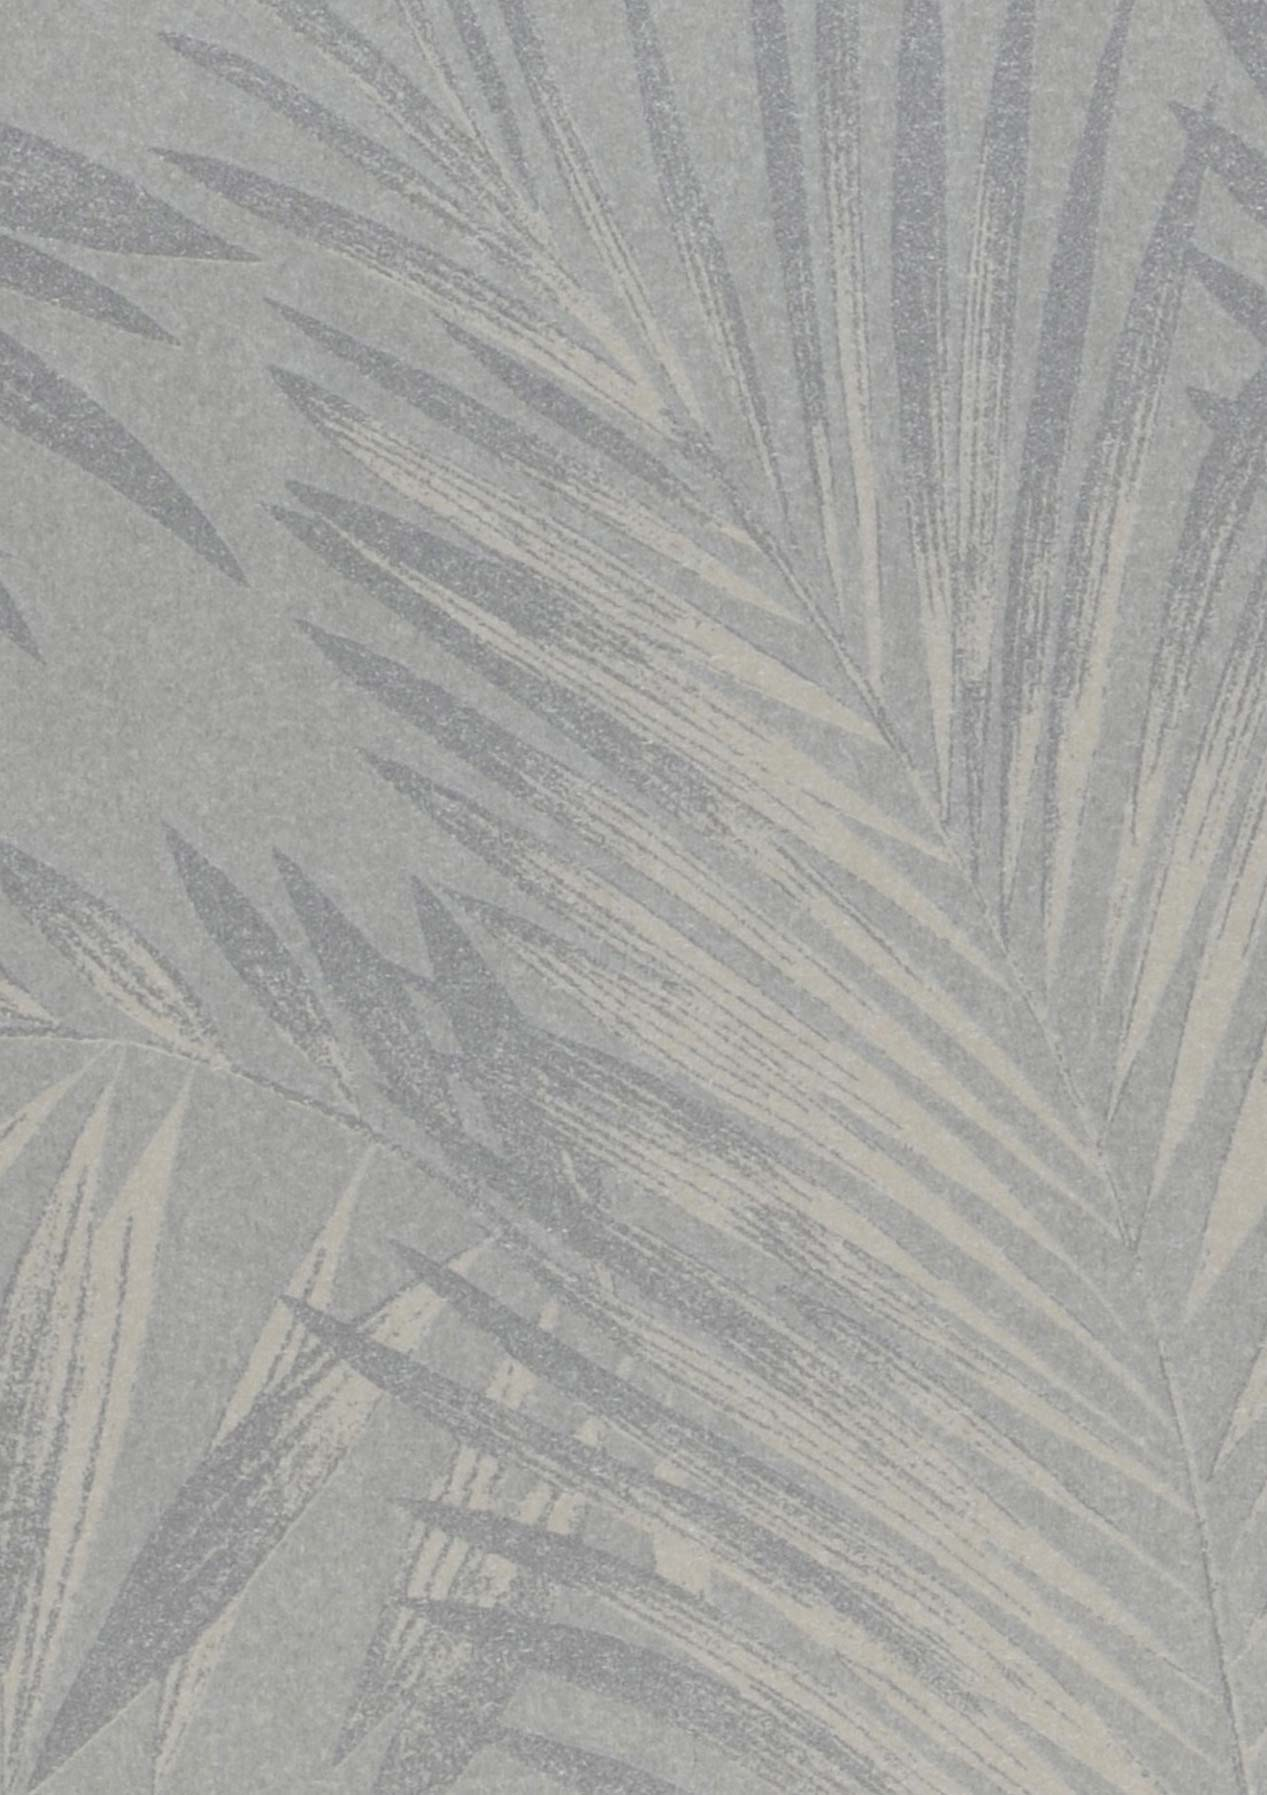 Aria bianco grigiastro avorio chiaro argento brillante for Carta parati argento